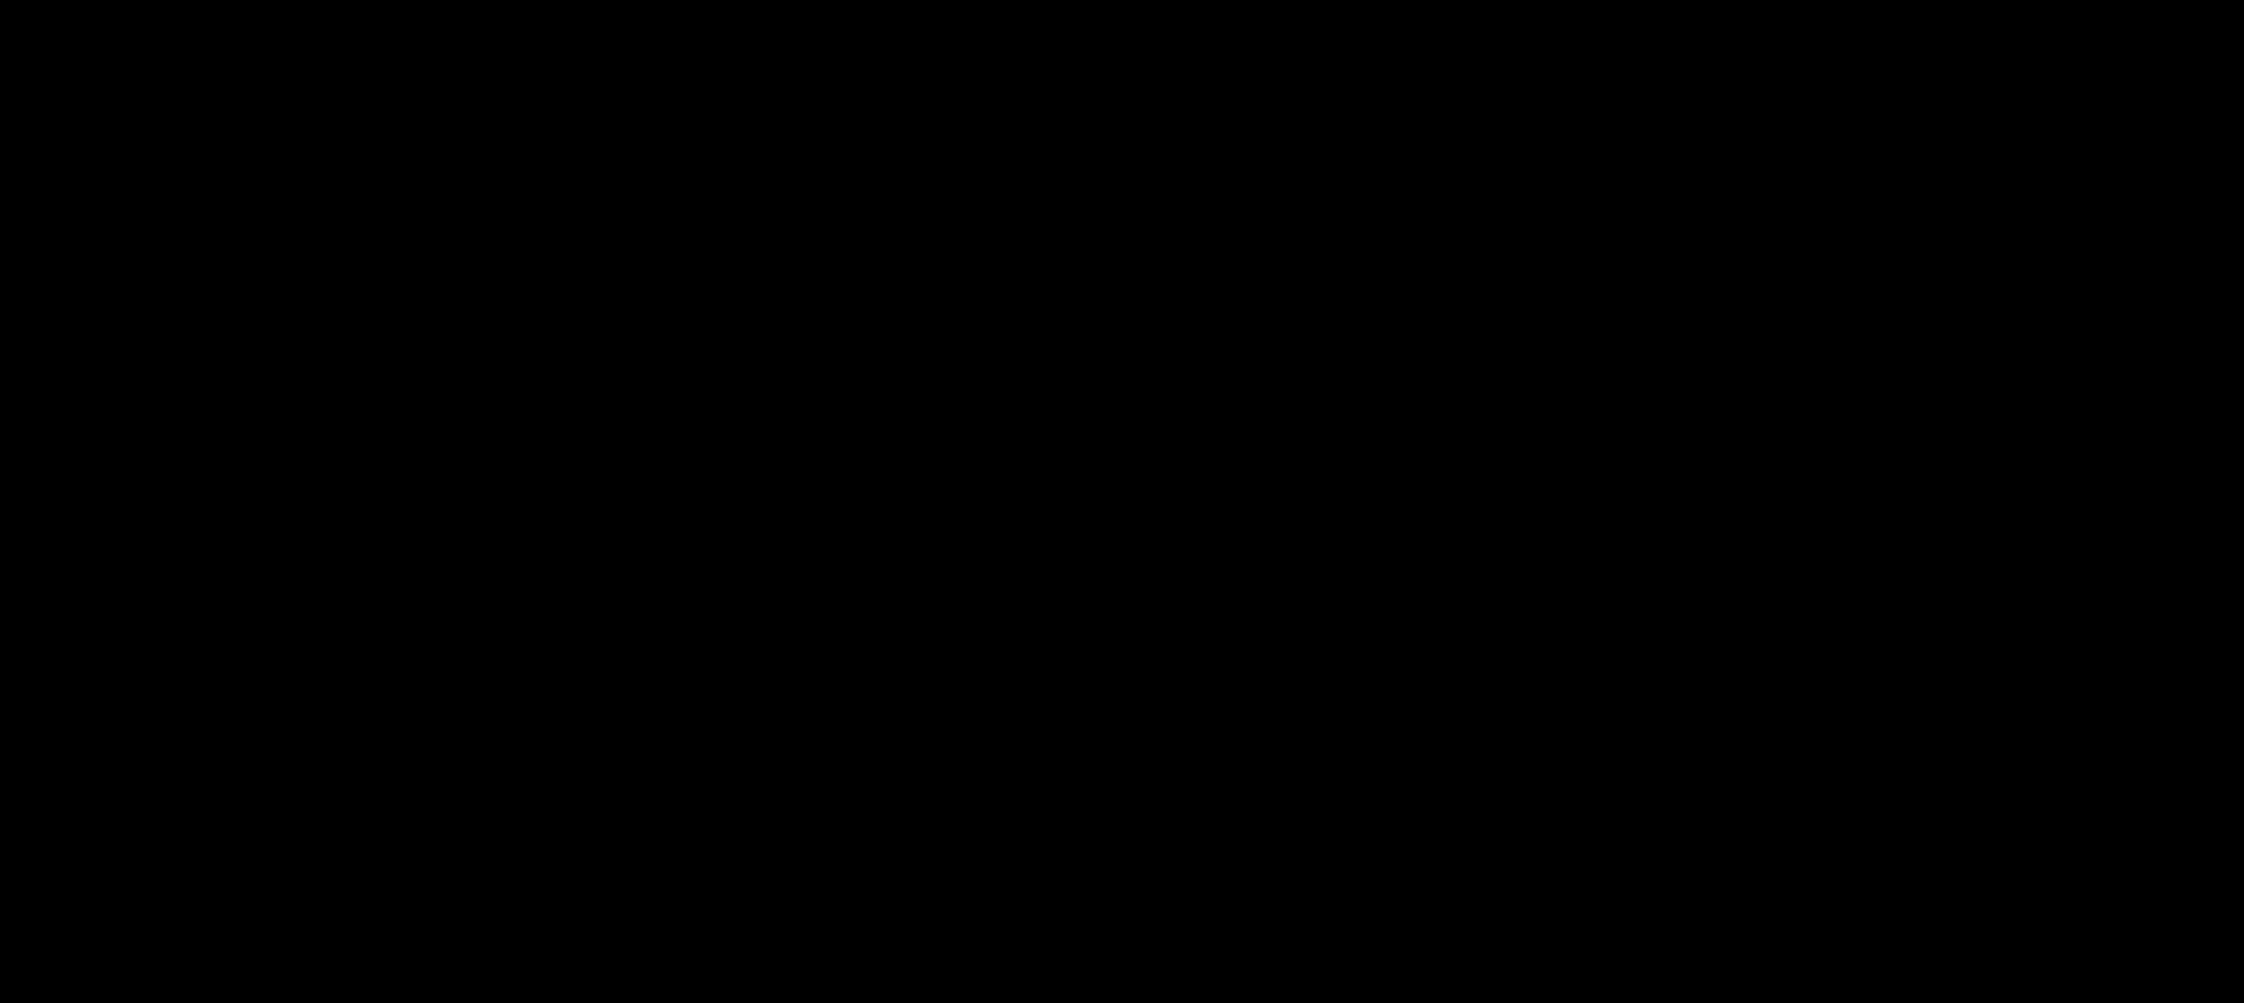 Dara Sekar's Signature